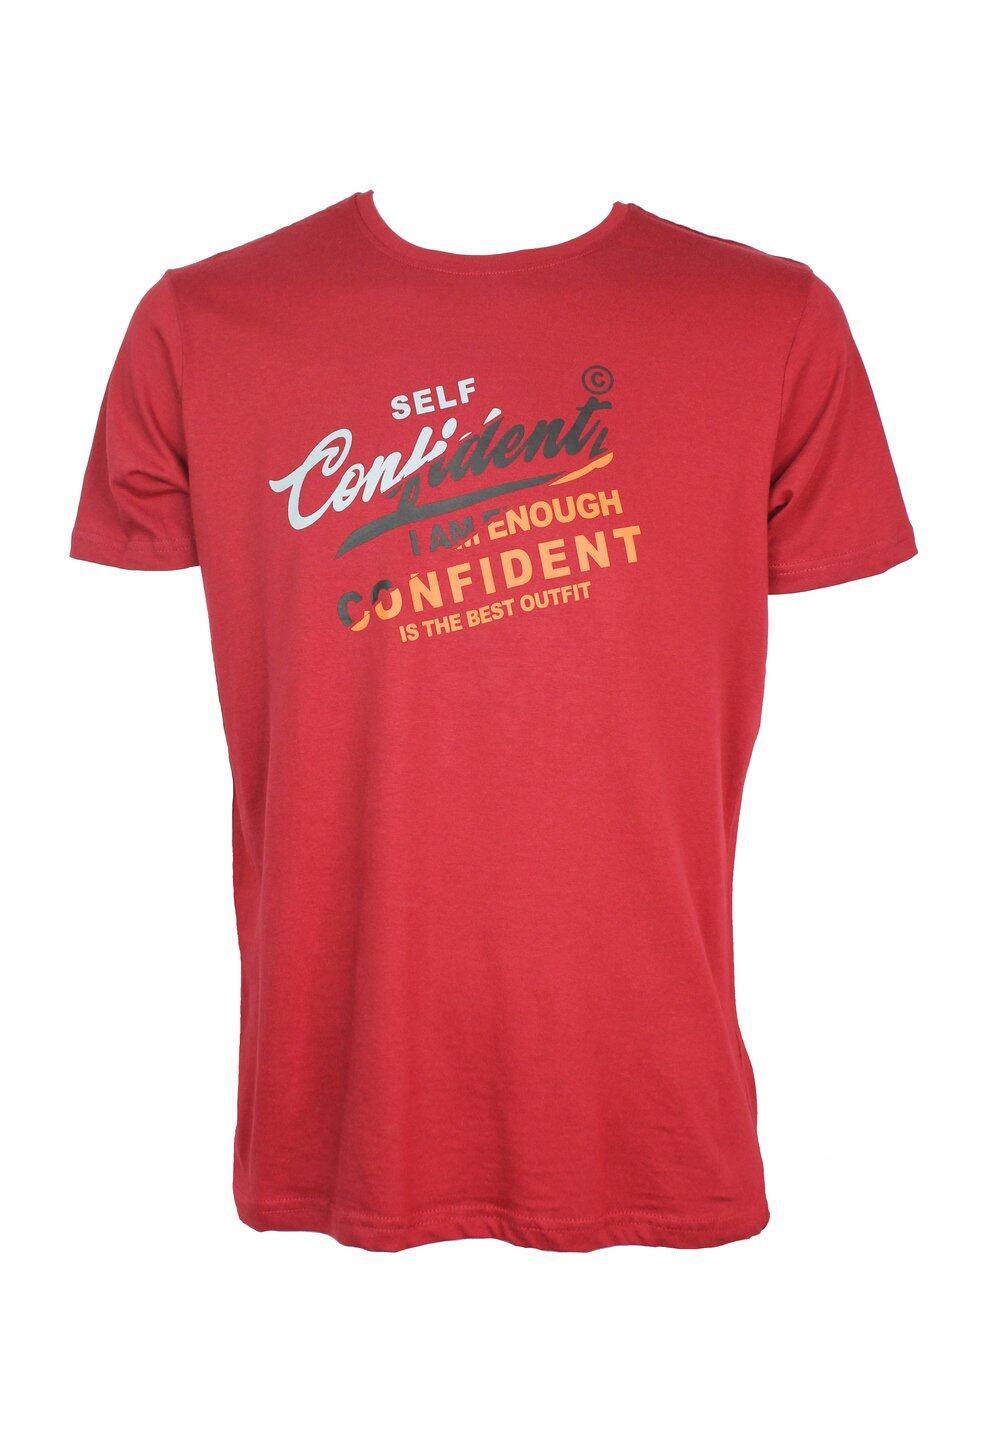 Self Confident Slogan Print T-shirt 964